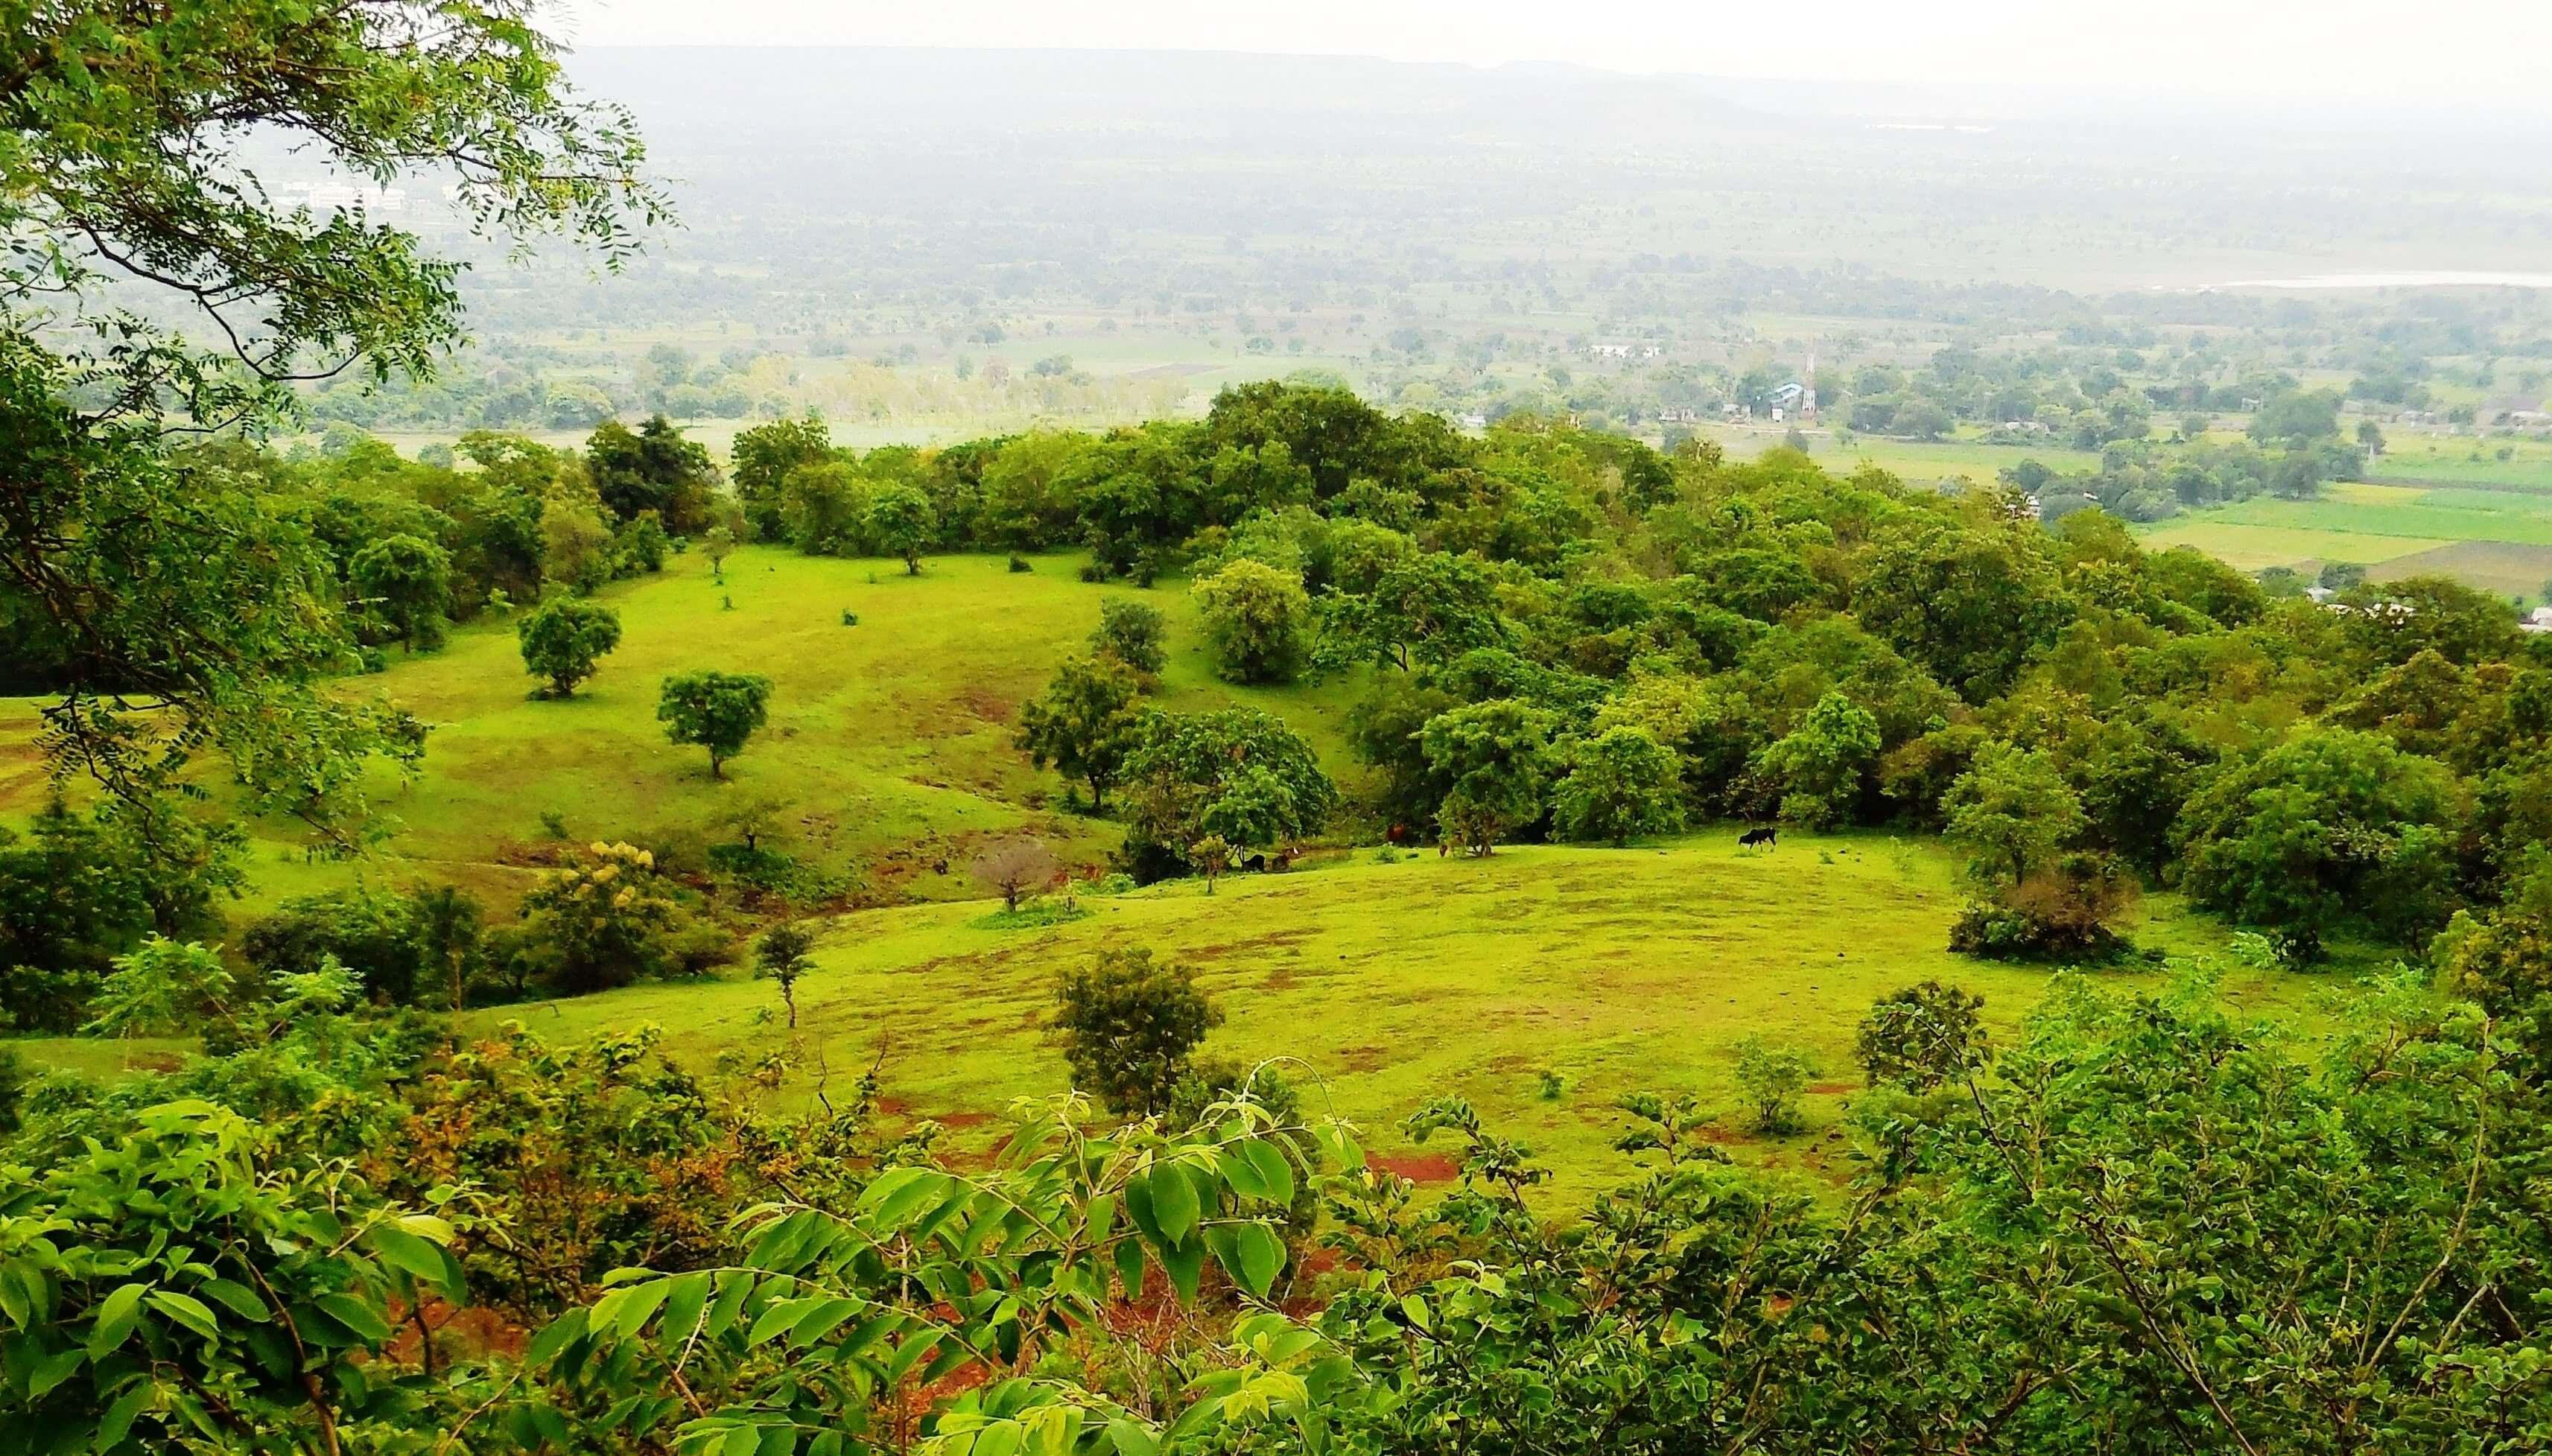 green valleys of Anantagriir